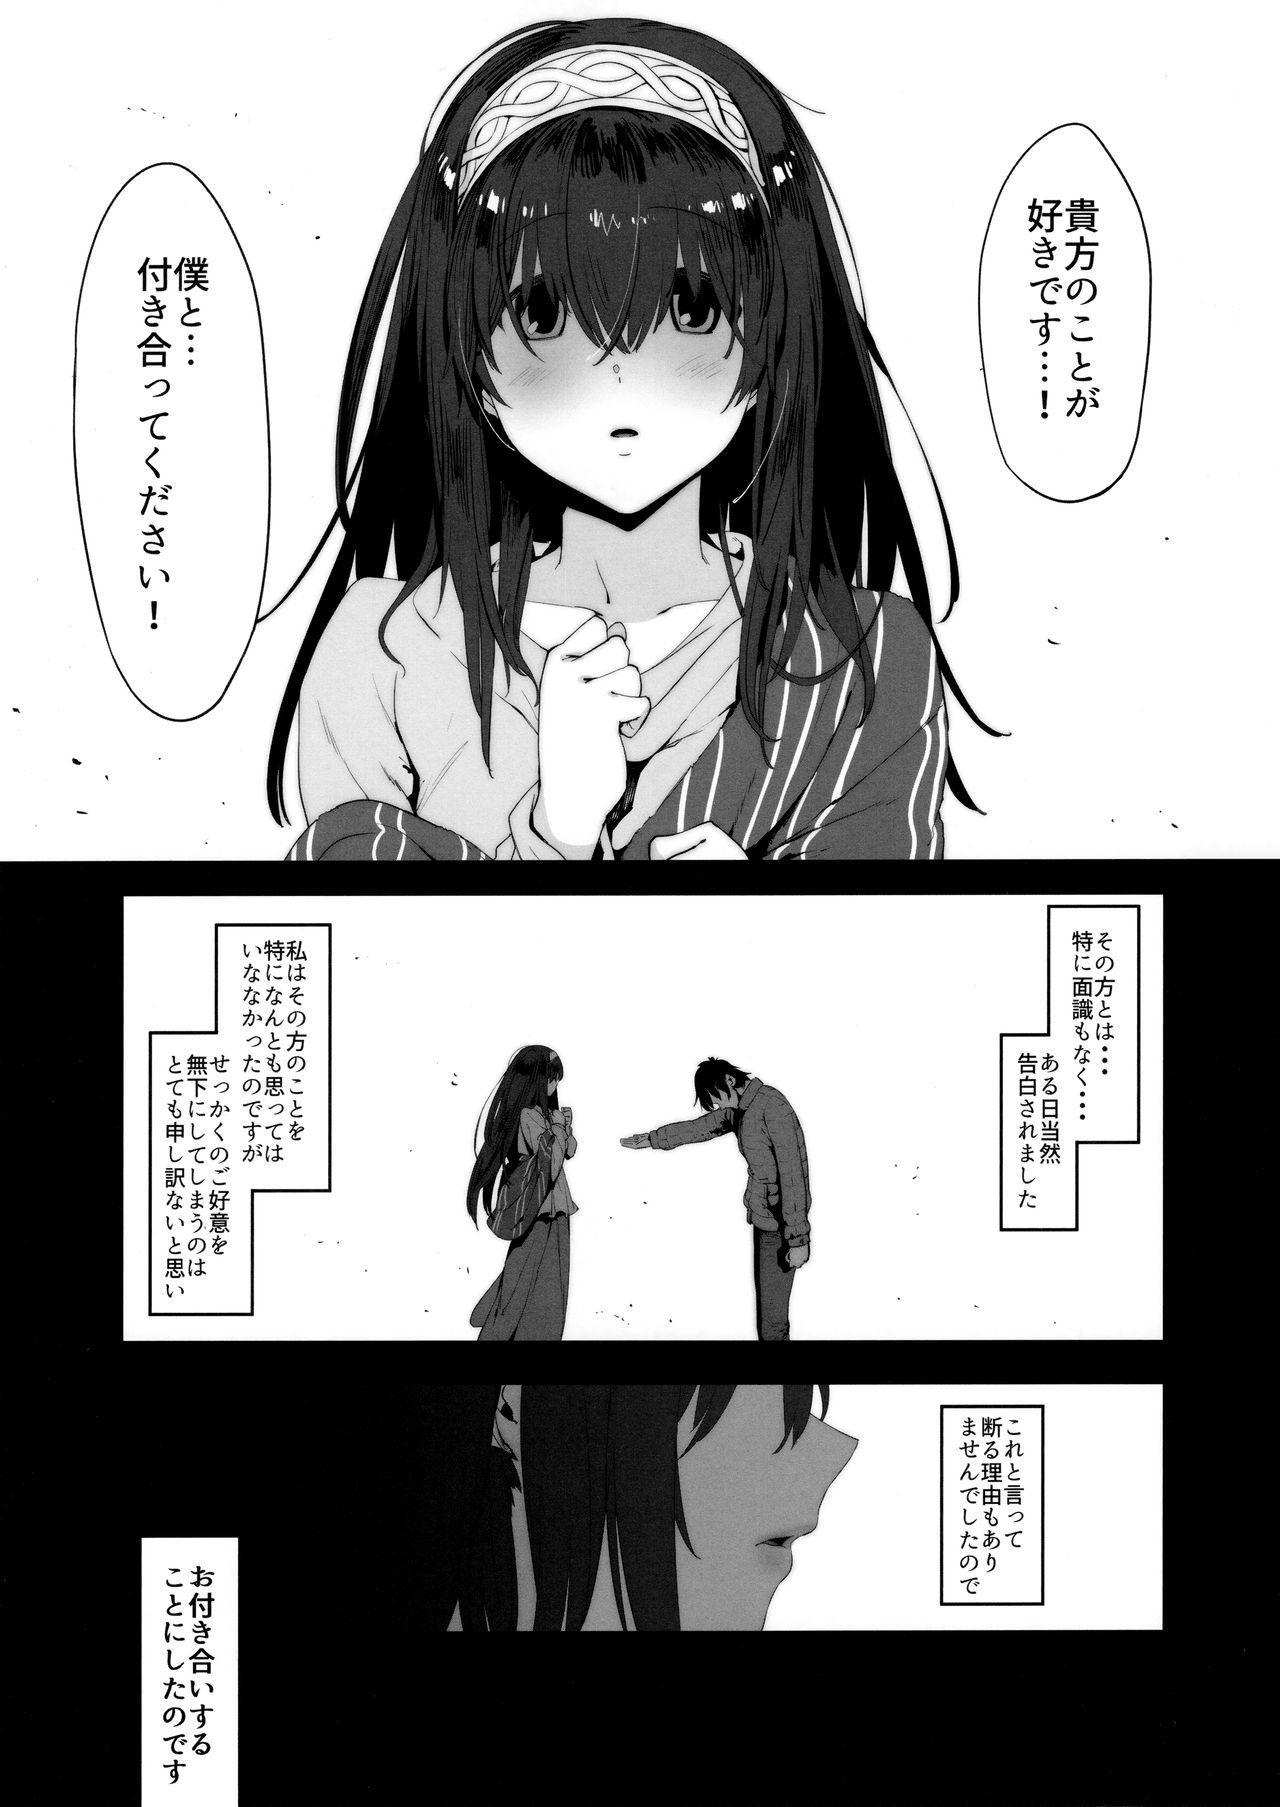 Sagisawa Fumika wa Yoku Moteru 1